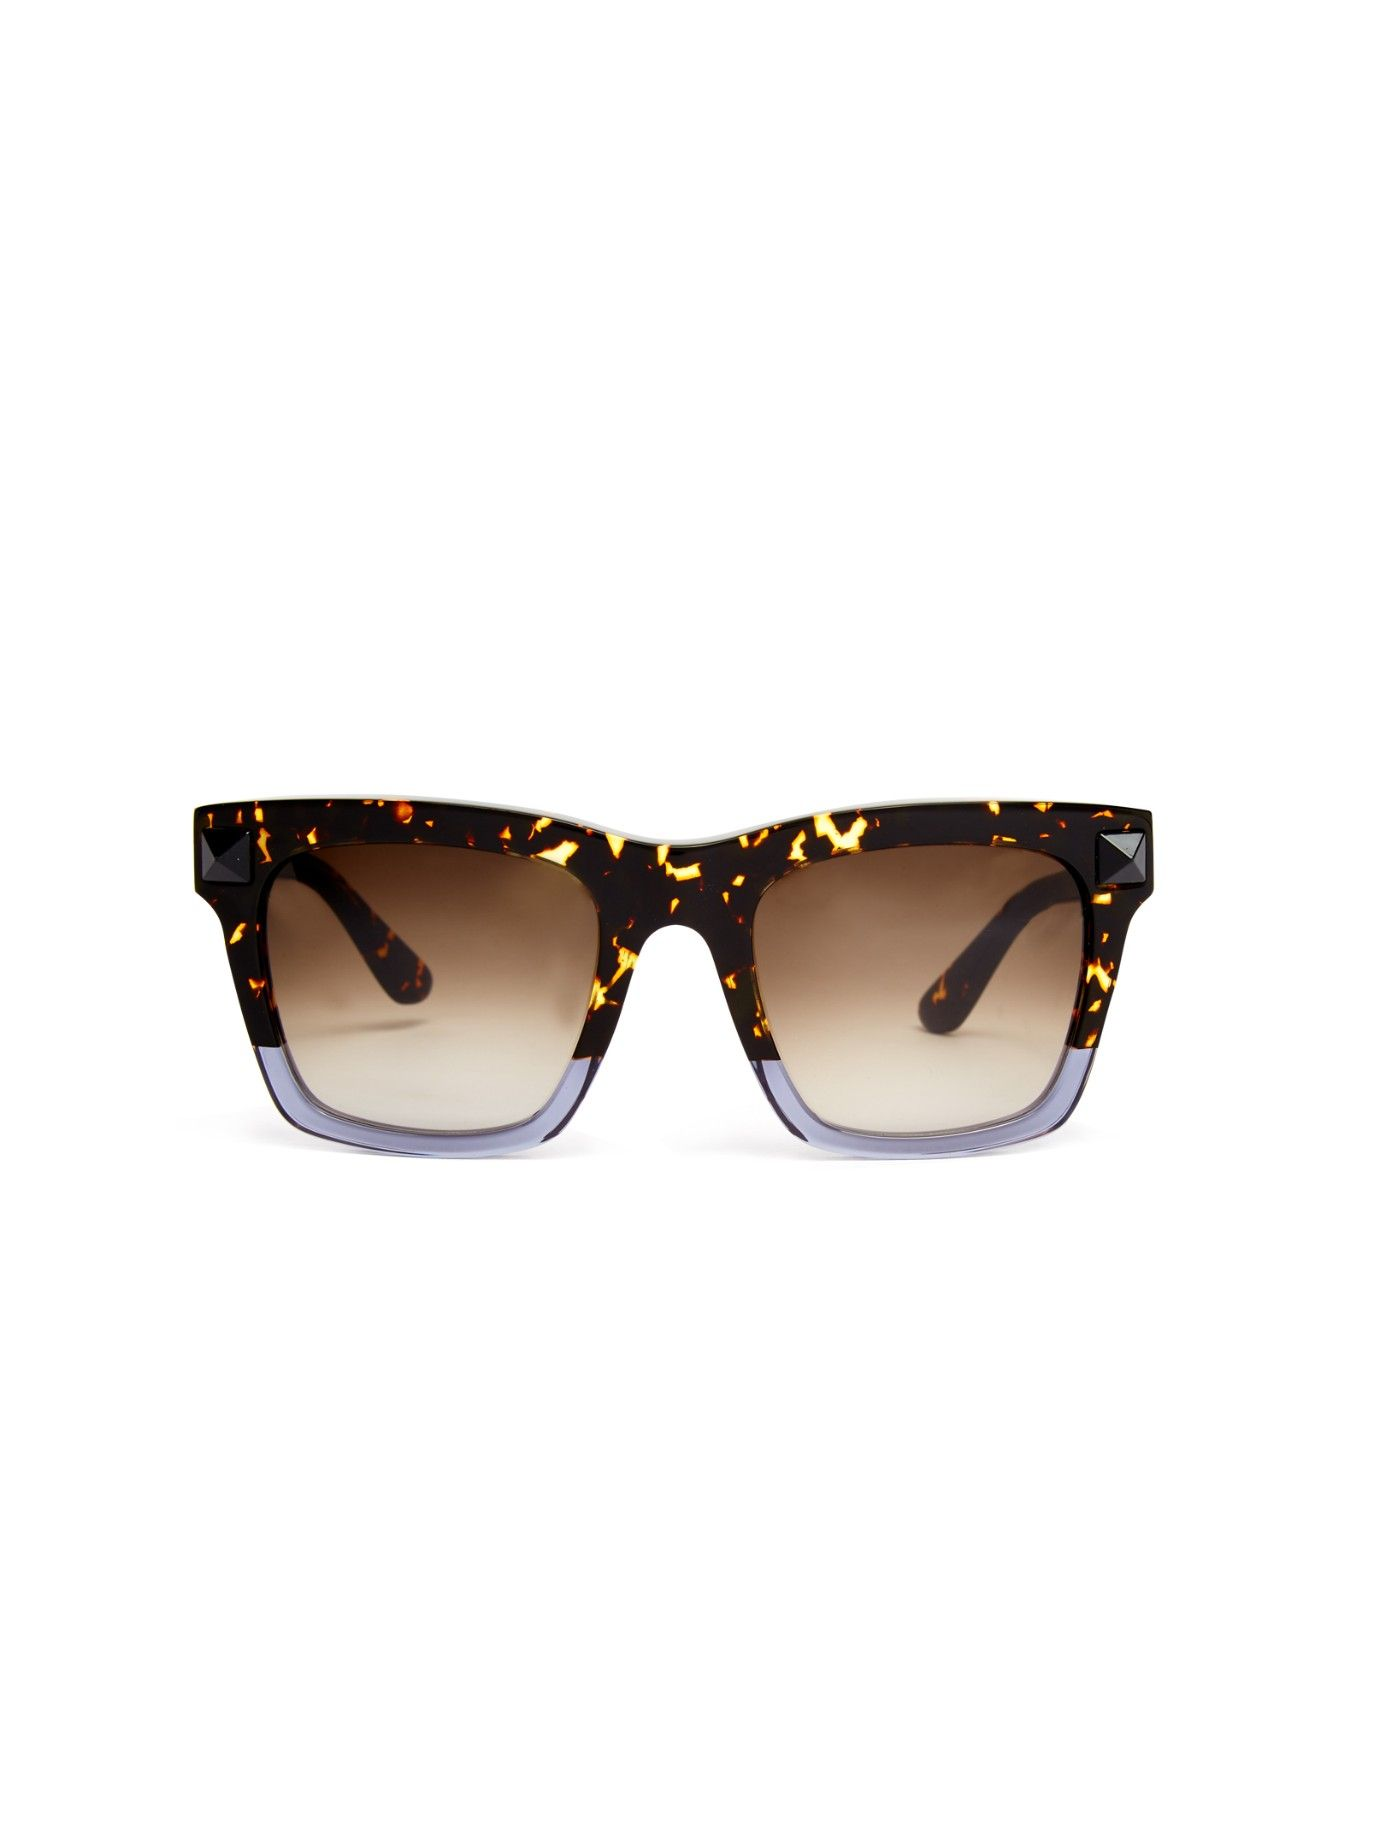 ef85a334f5e Square-framed tortoiseshell sunglasses